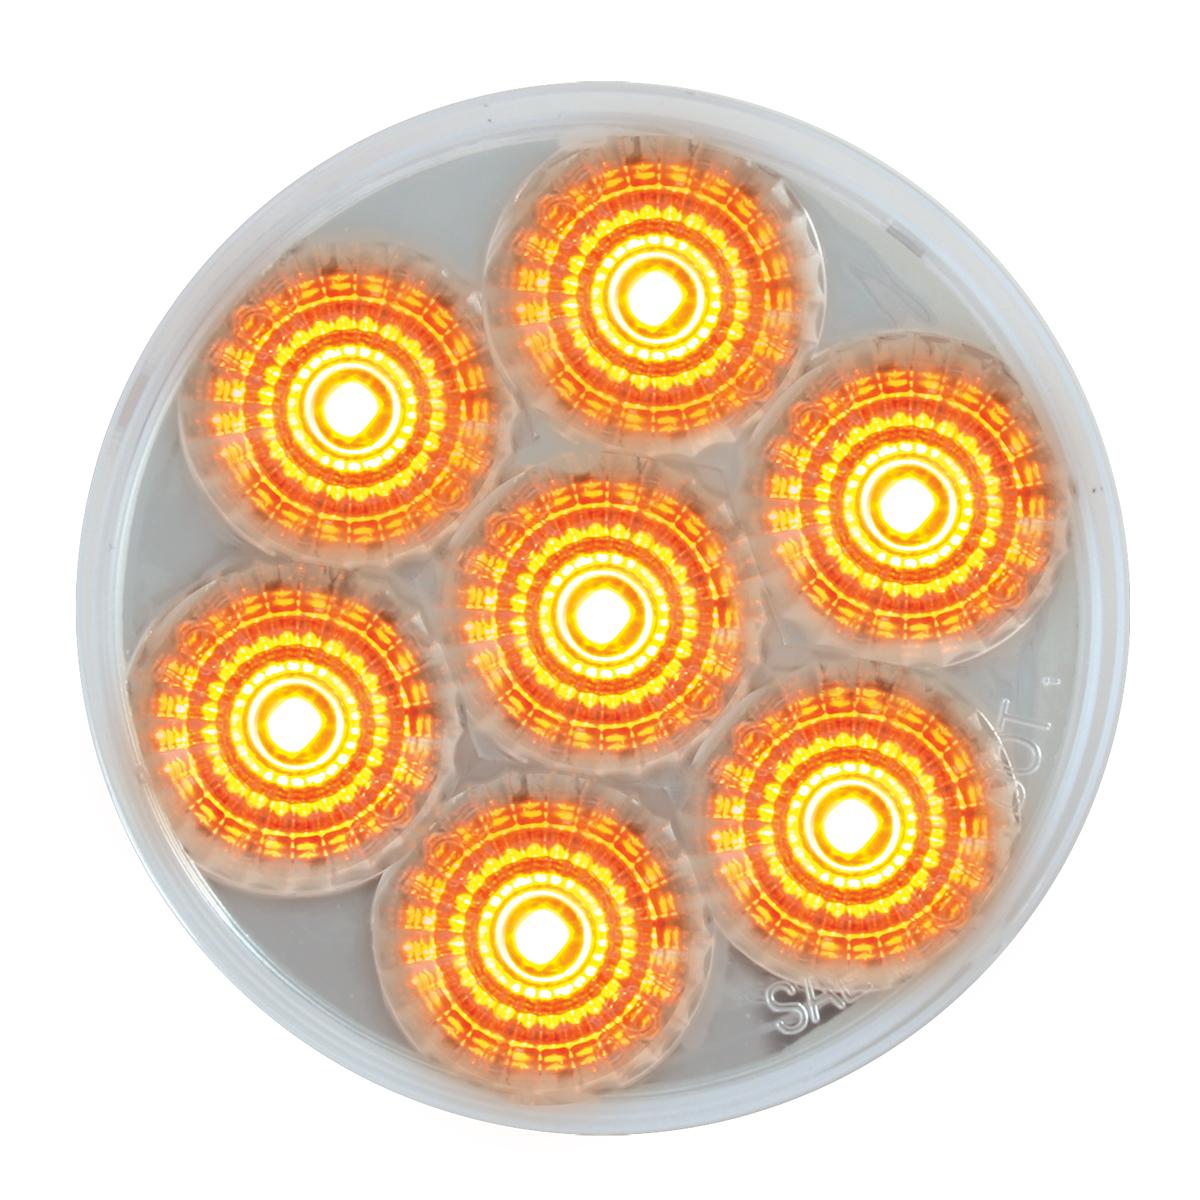 "76661 2-1/2"" Spyder LED Marker Light"